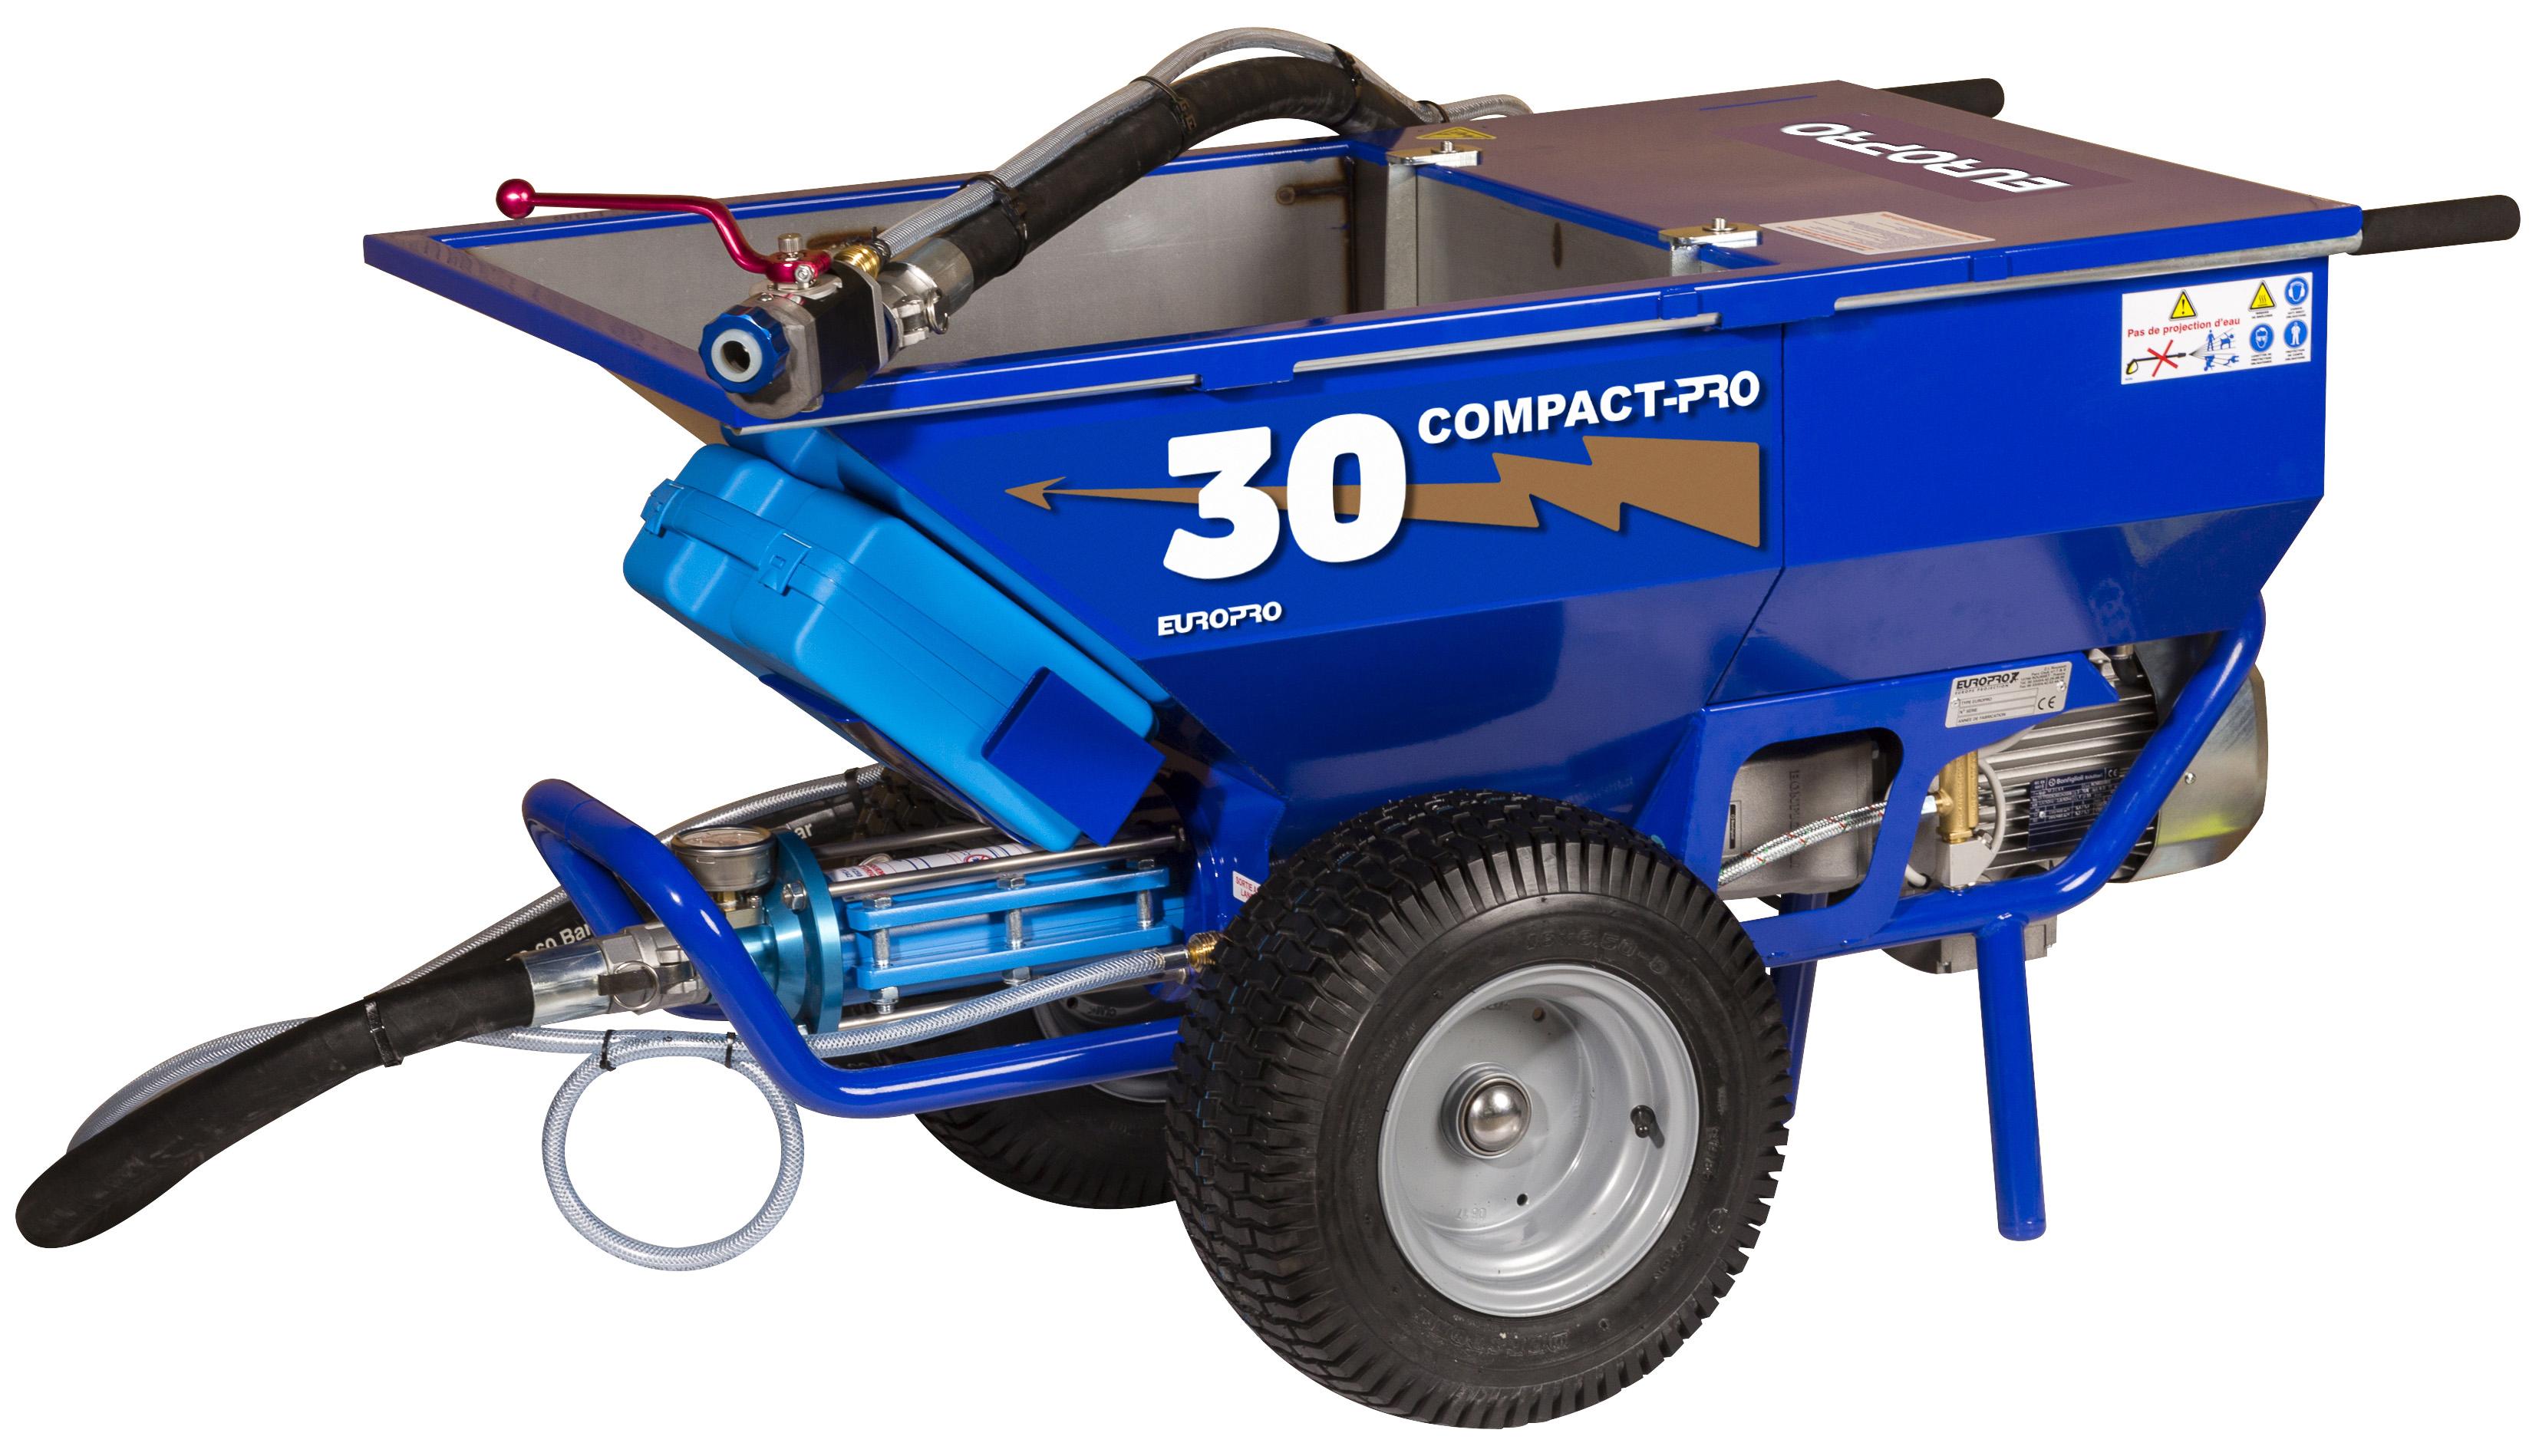 machine enduire compact pro 30 version mortier. Black Bedroom Furniture Sets. Home Design Ideas